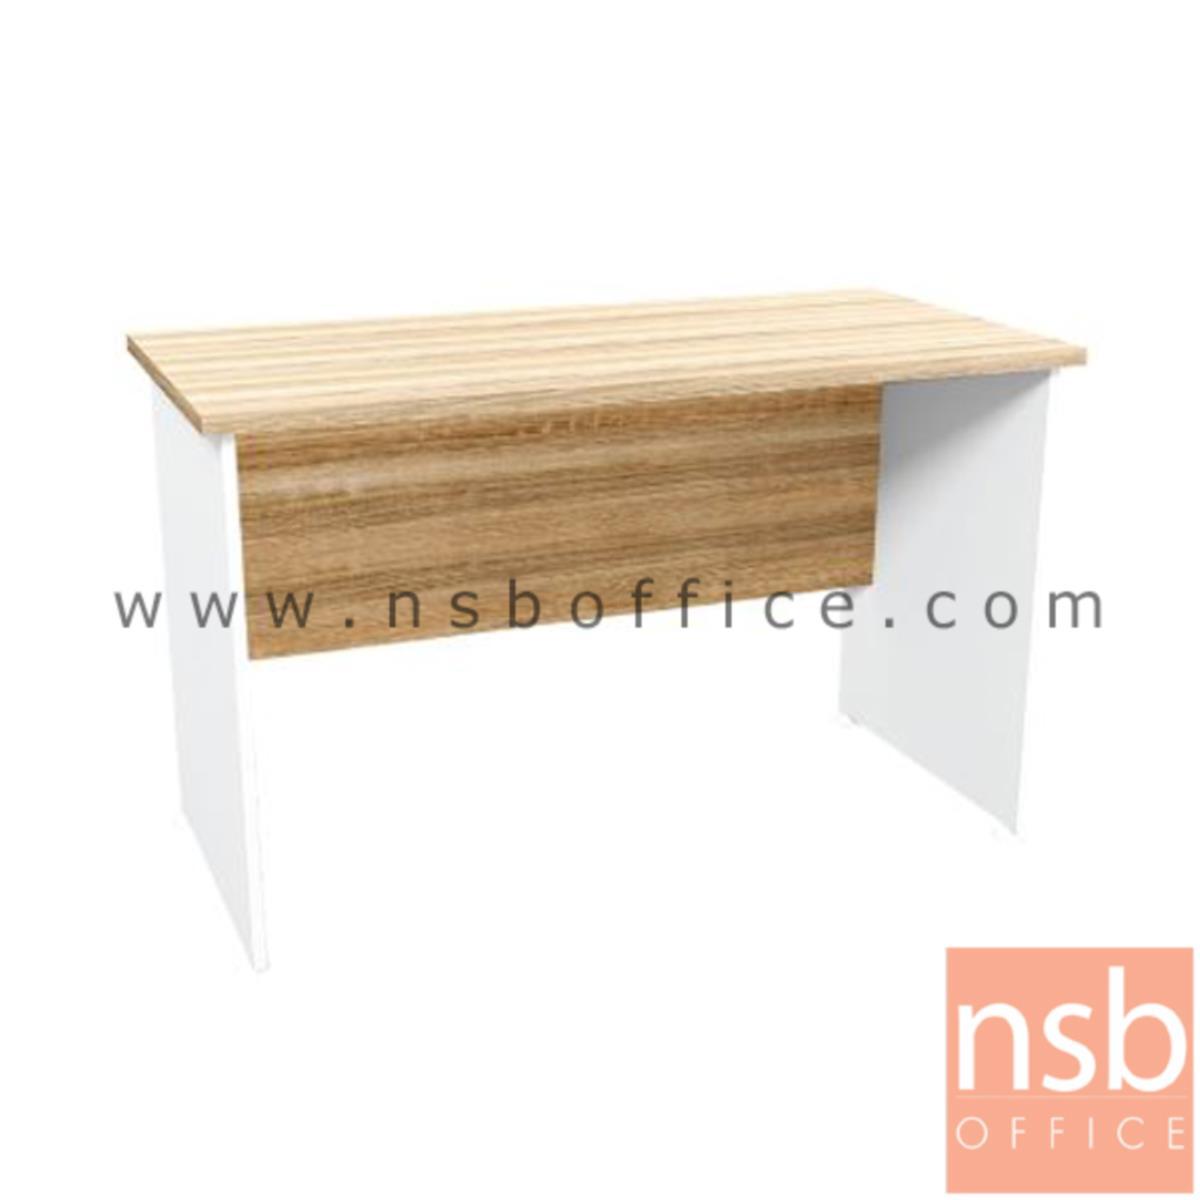 A21A001:โต๊ะทำงาน รุ่น Alpine (ออลไพน์) ขนาด 120W ,150W cm.  เมลามีน สีเนเจอร์ทีค-ขาว